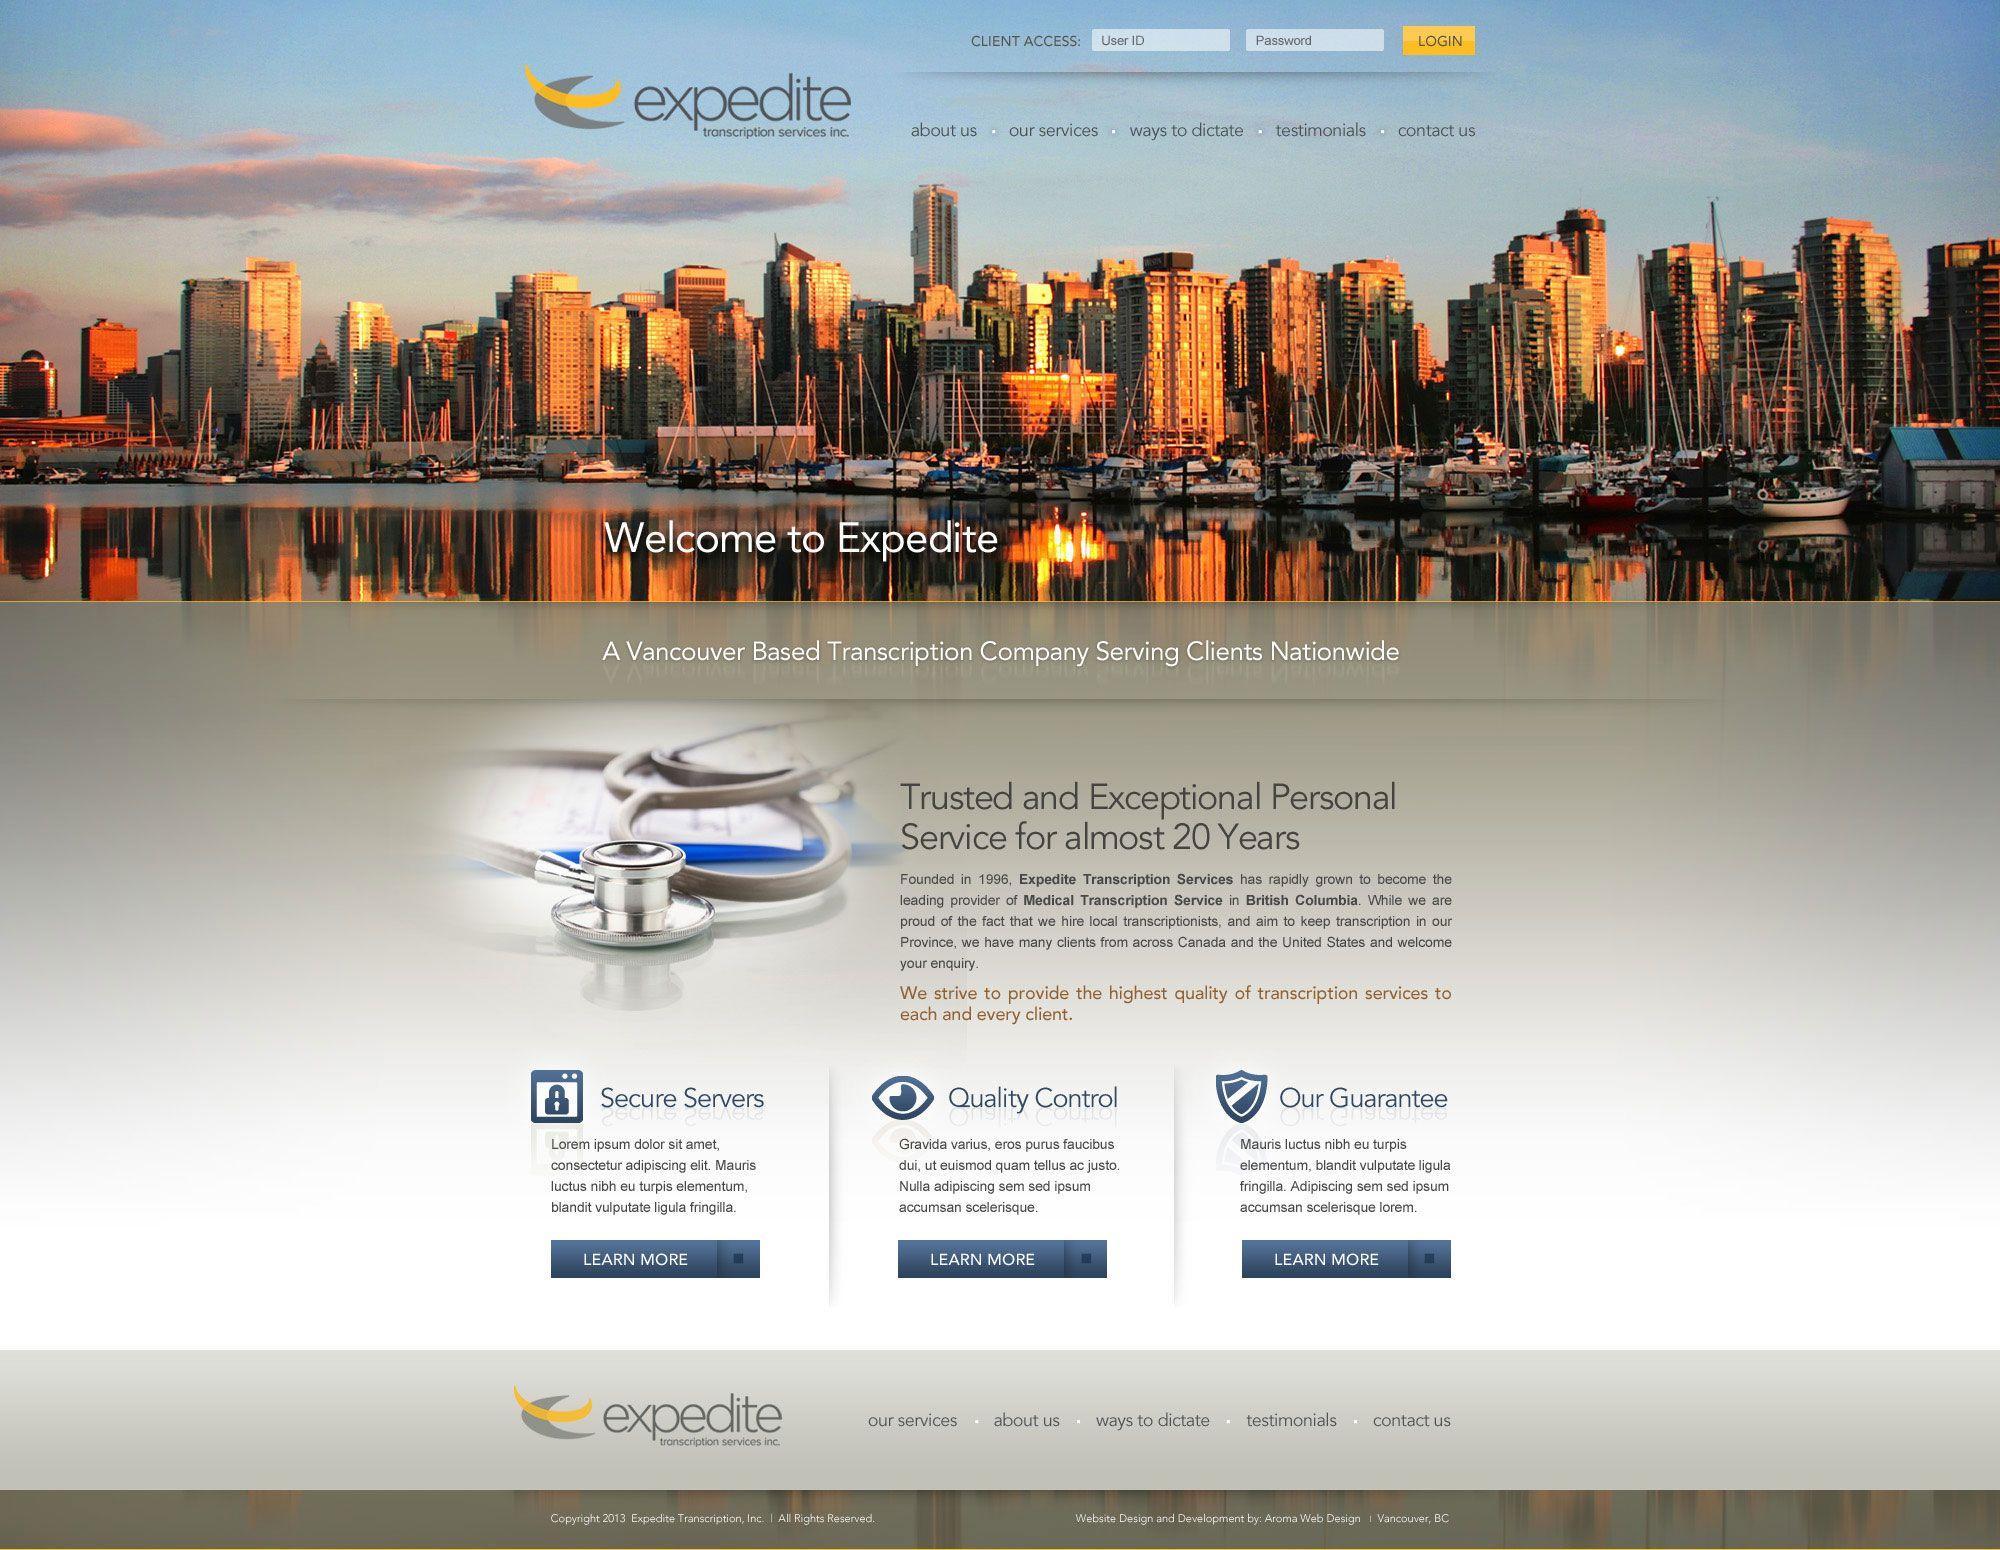 Vancouver Web Design Company Mining Construction Web Design Fun Website Design Web Design Company Business Website Design